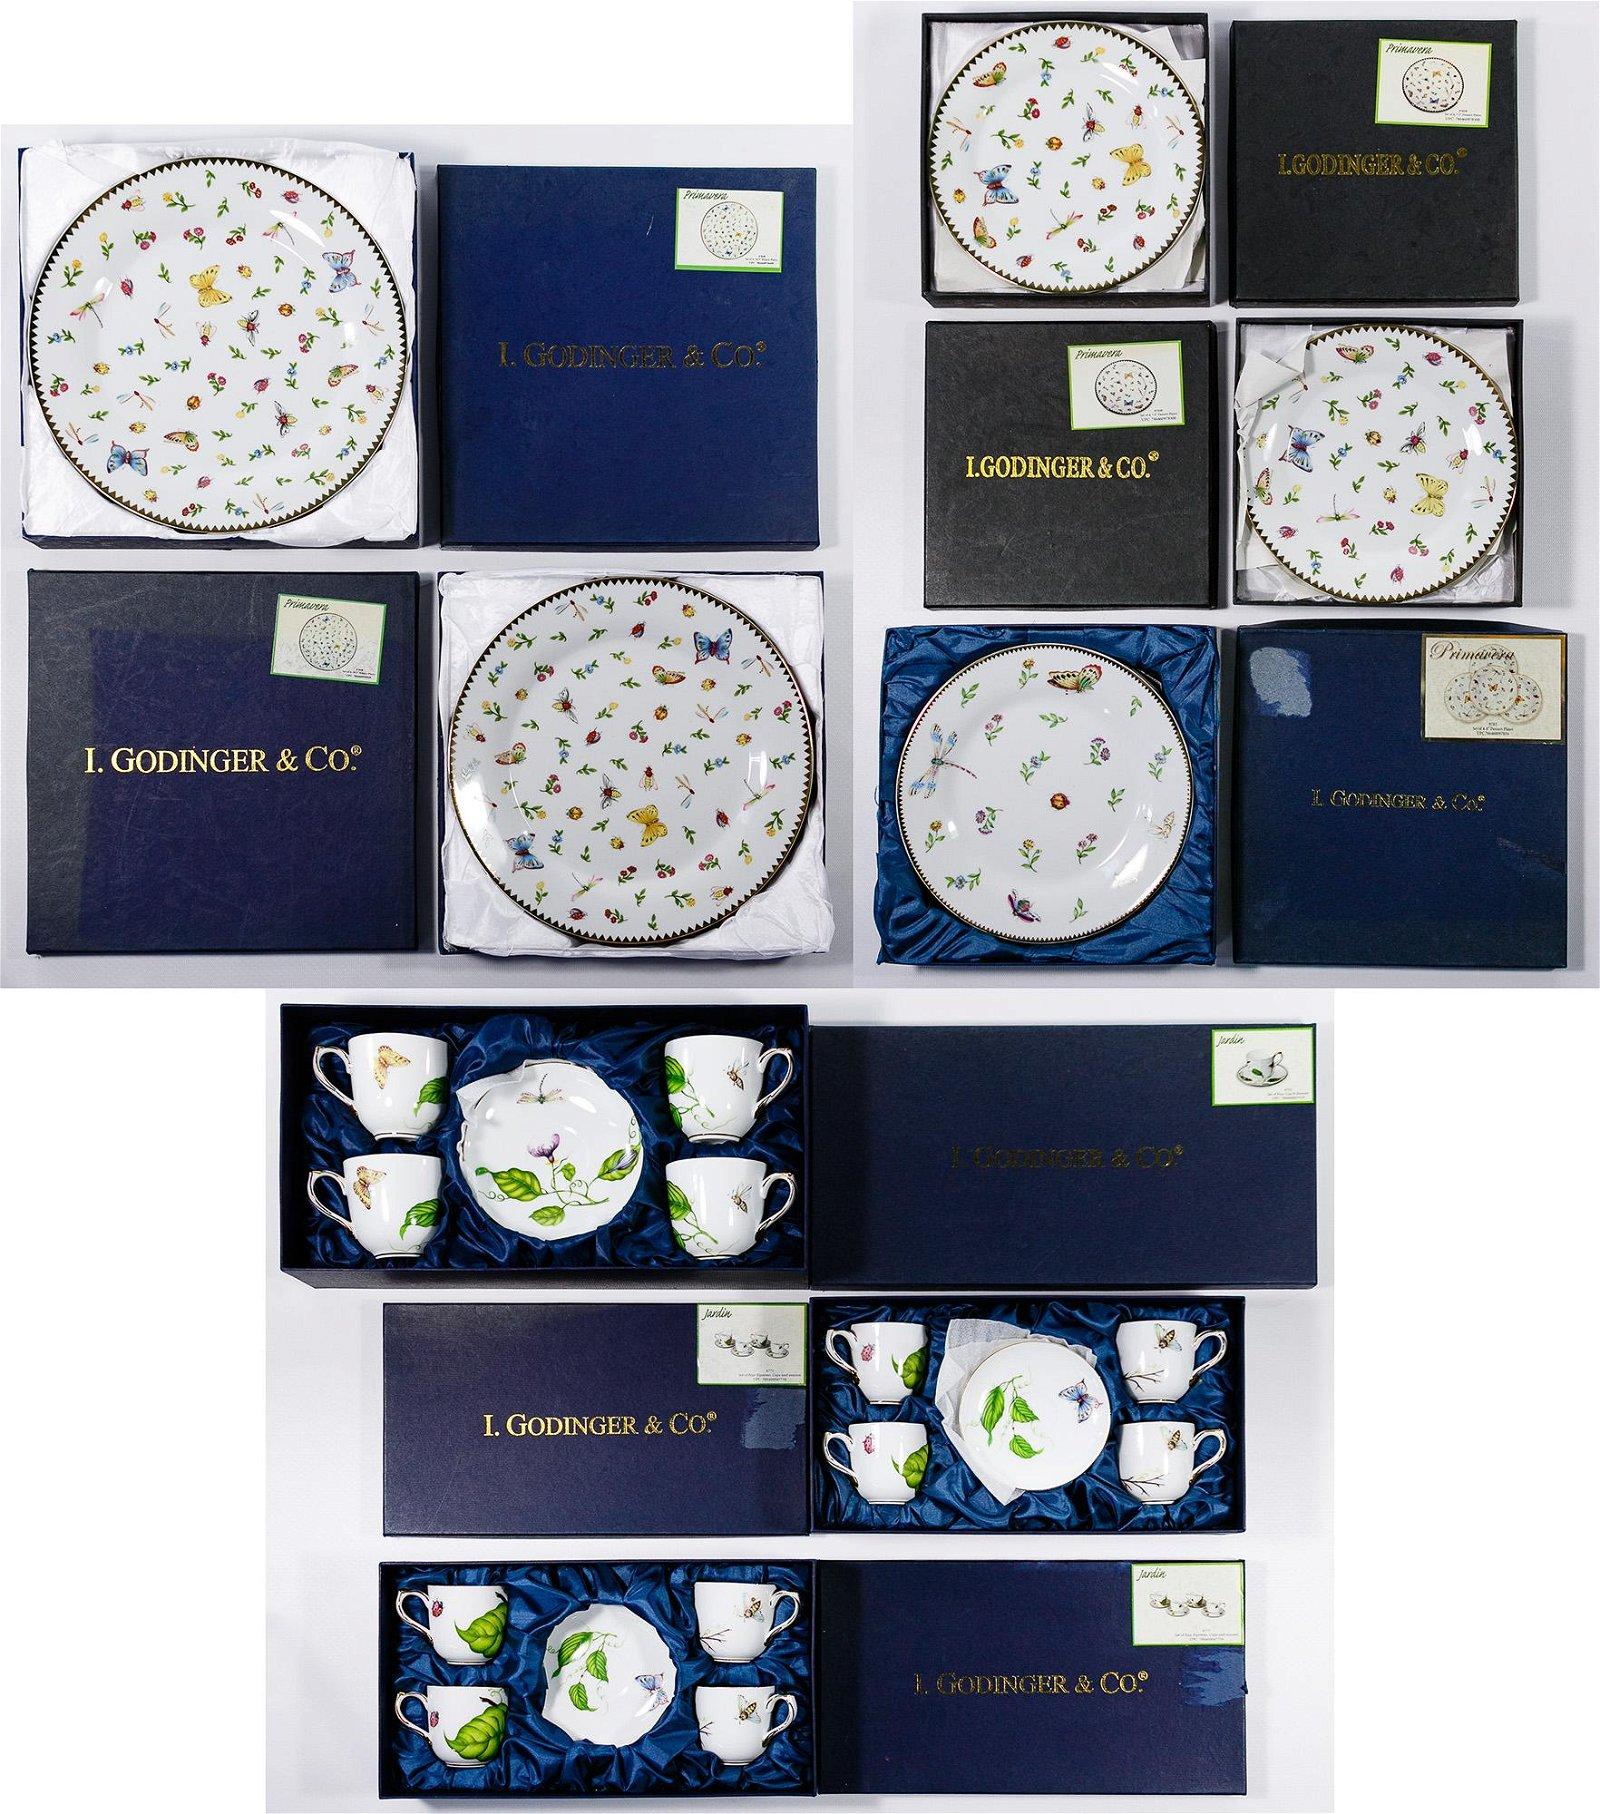 I. Godinger & Co. 'Jardin' Porcelain China